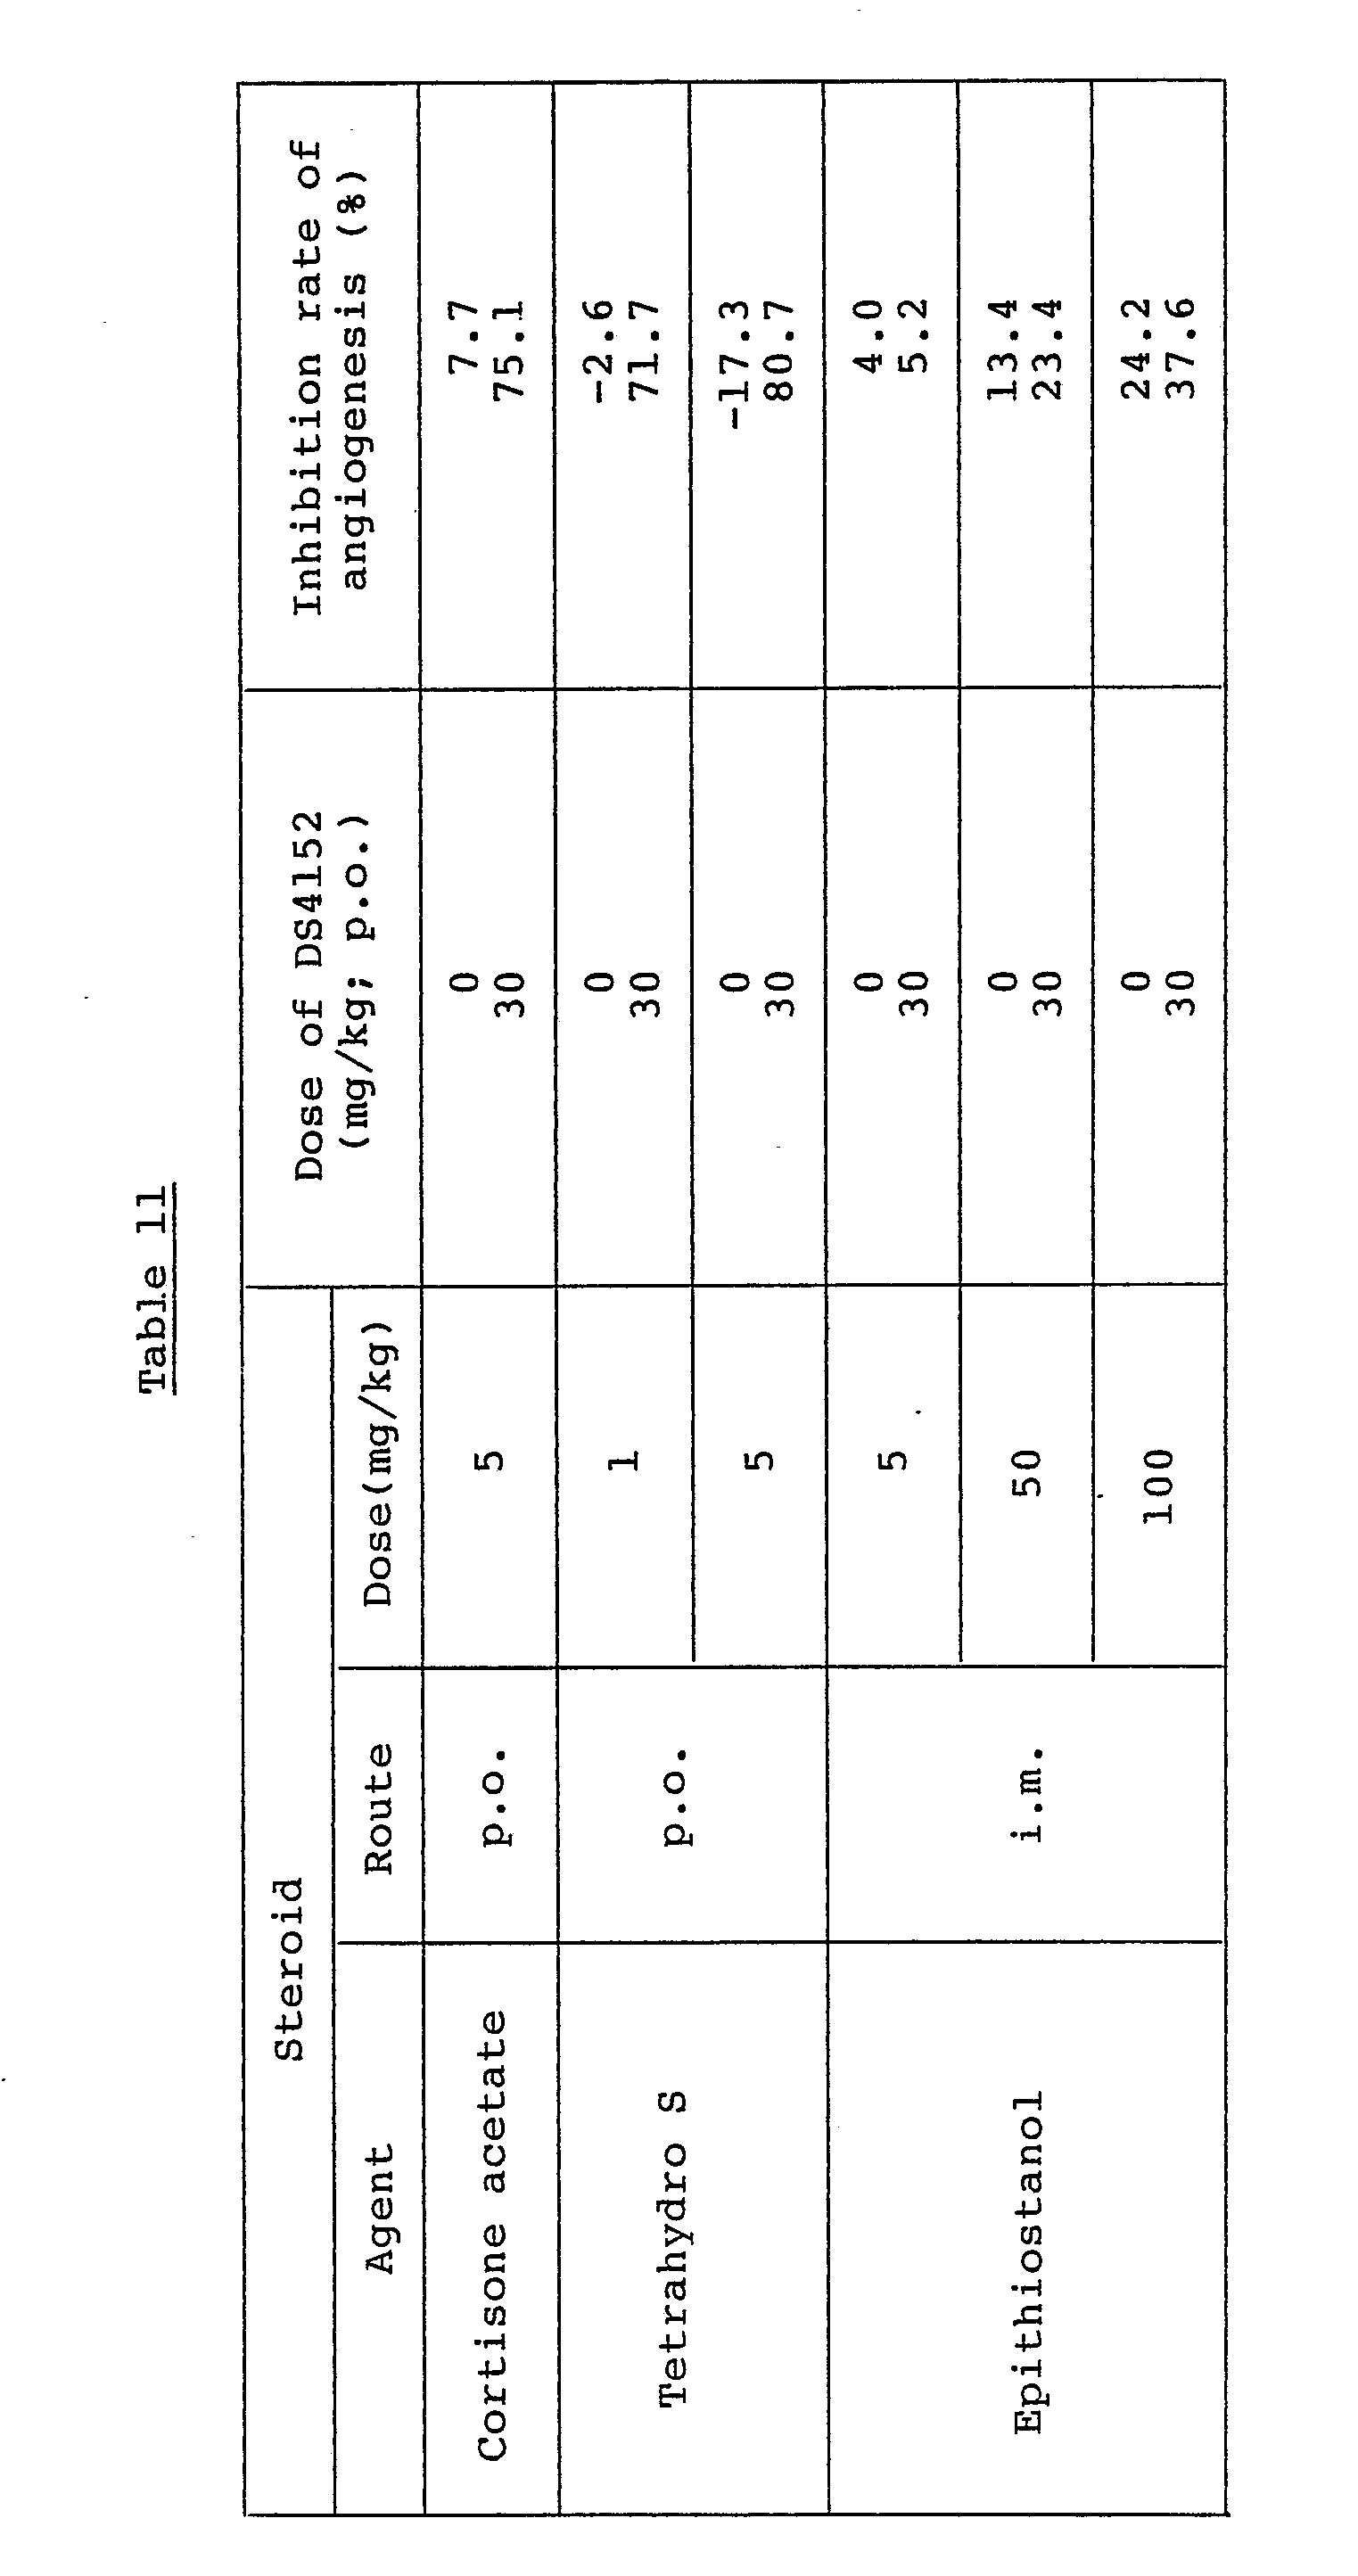 专利ep0246654a2 - use